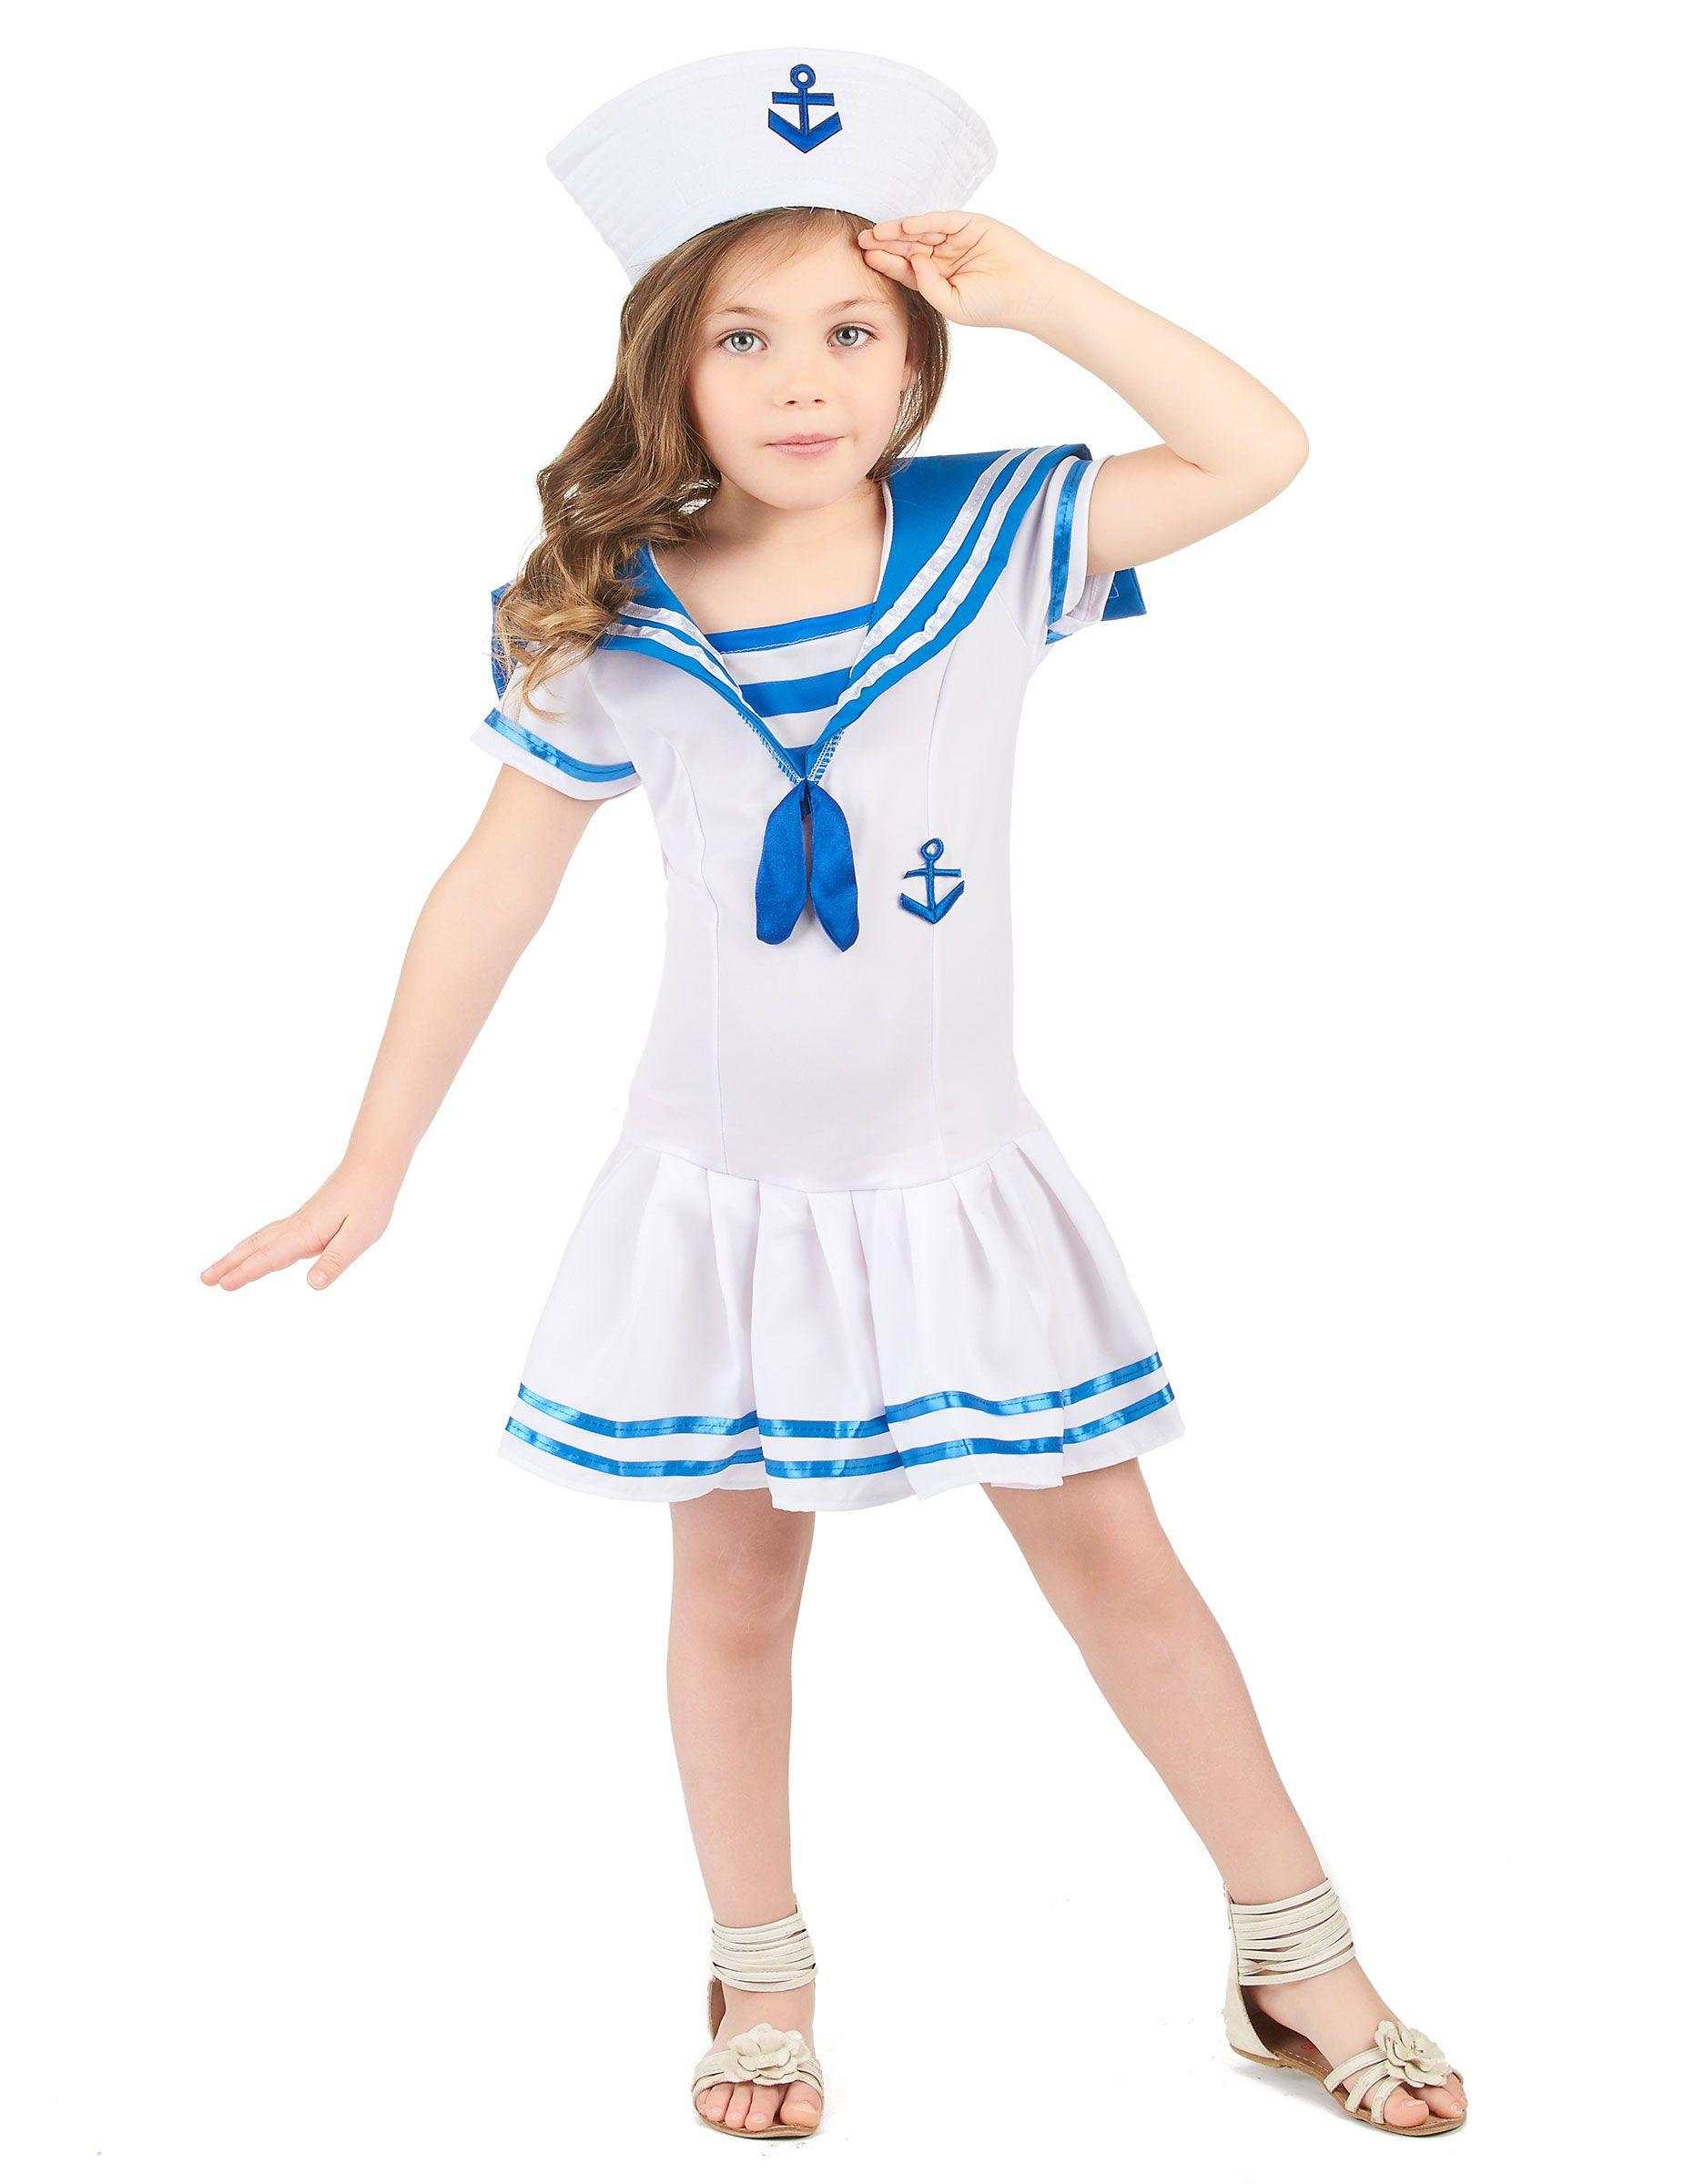 Disfraz marinero niña | Disfraz marinera, Disfraz de